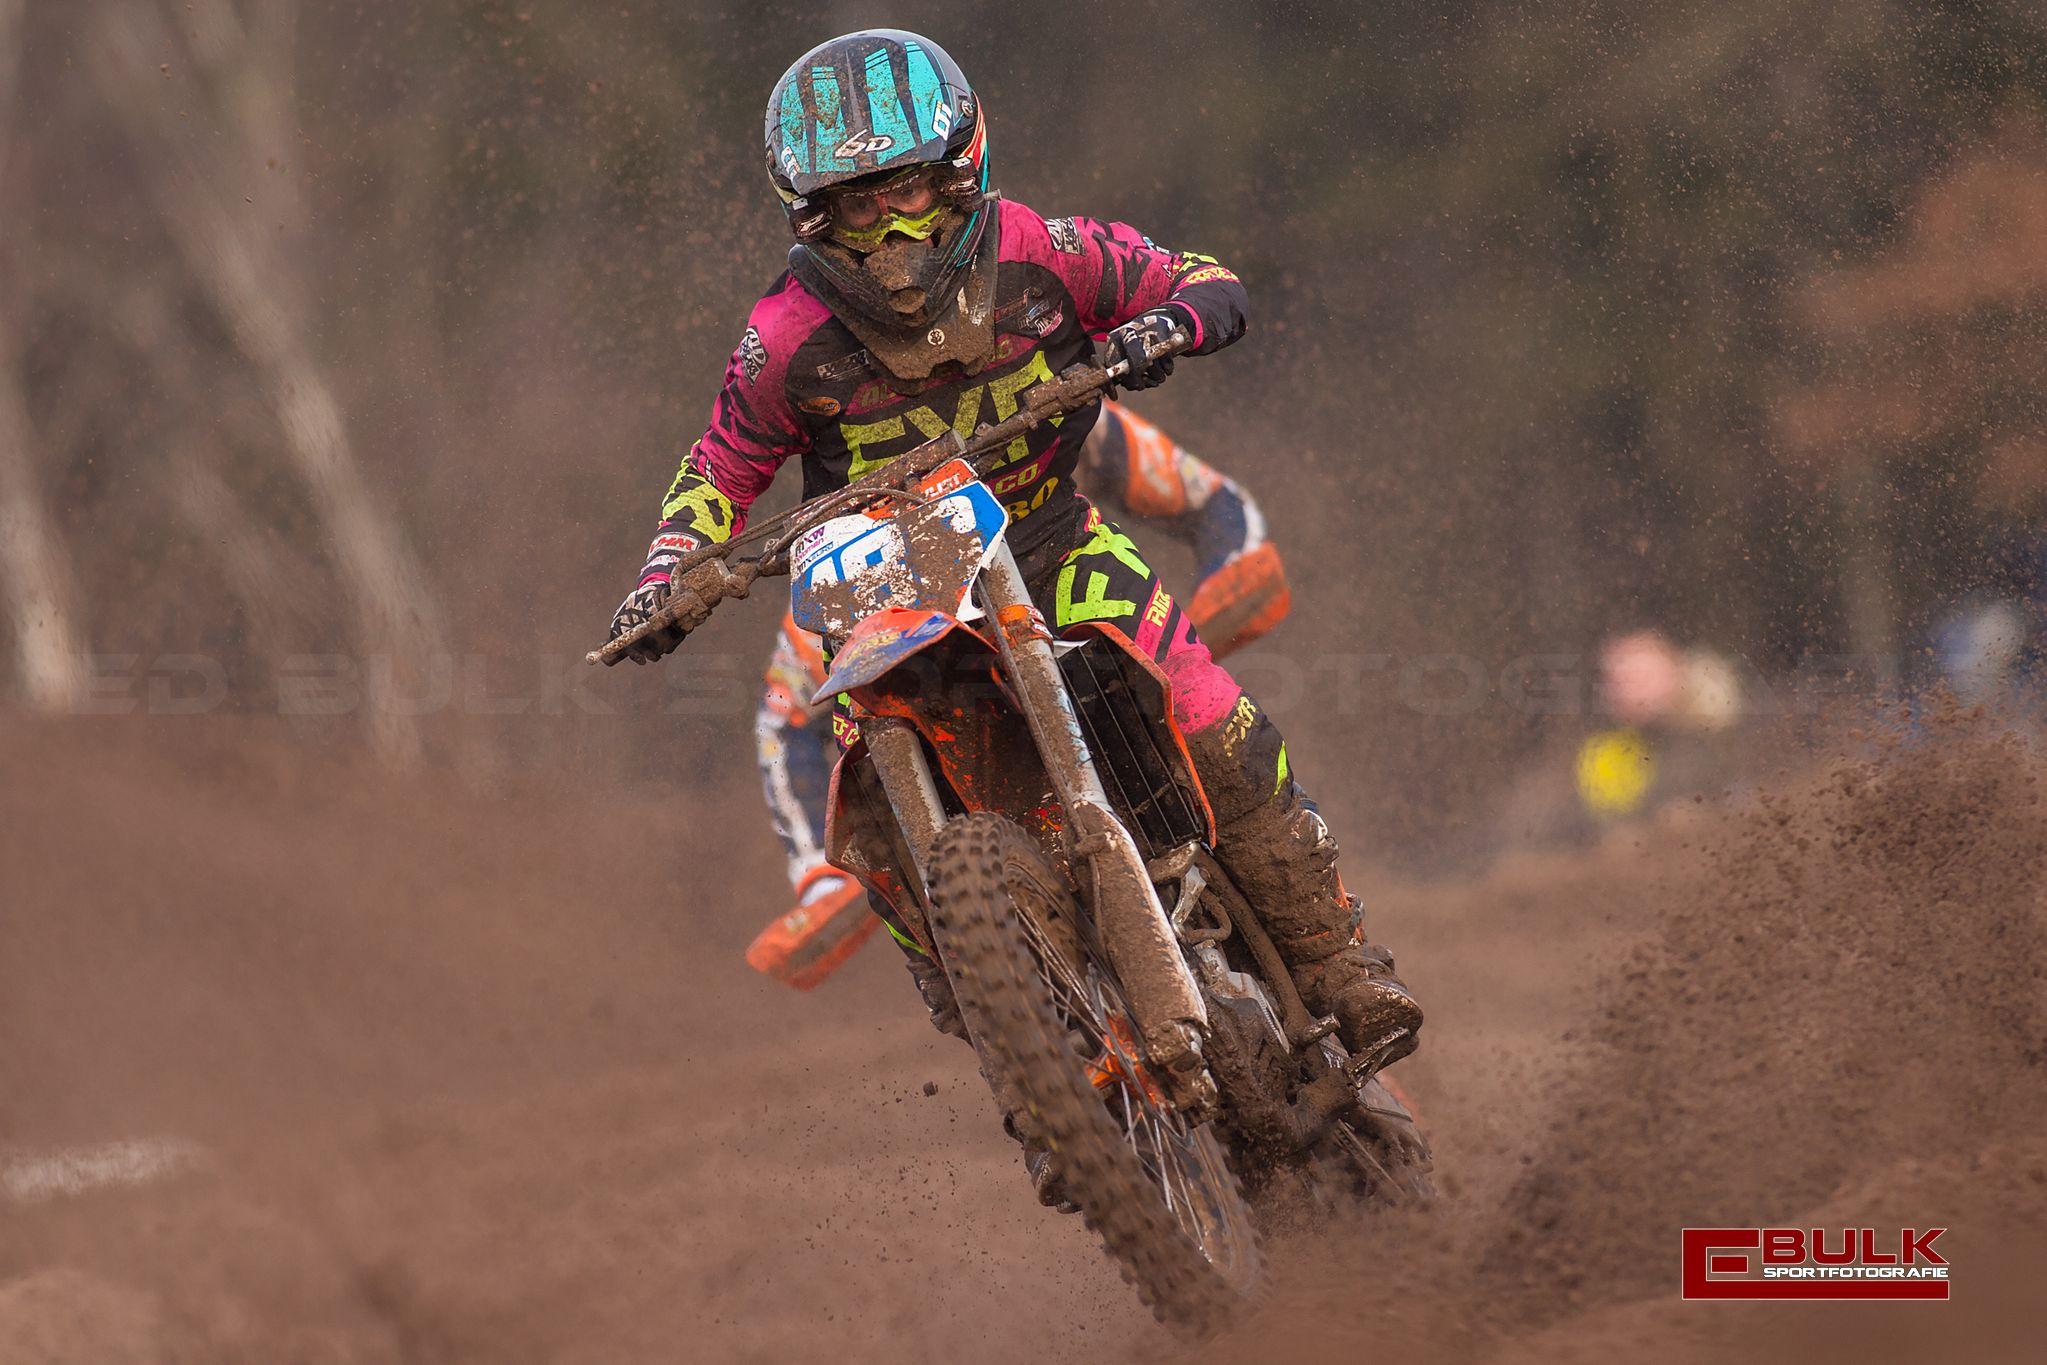 ebs_1121-ed_bulk_sportfotografie